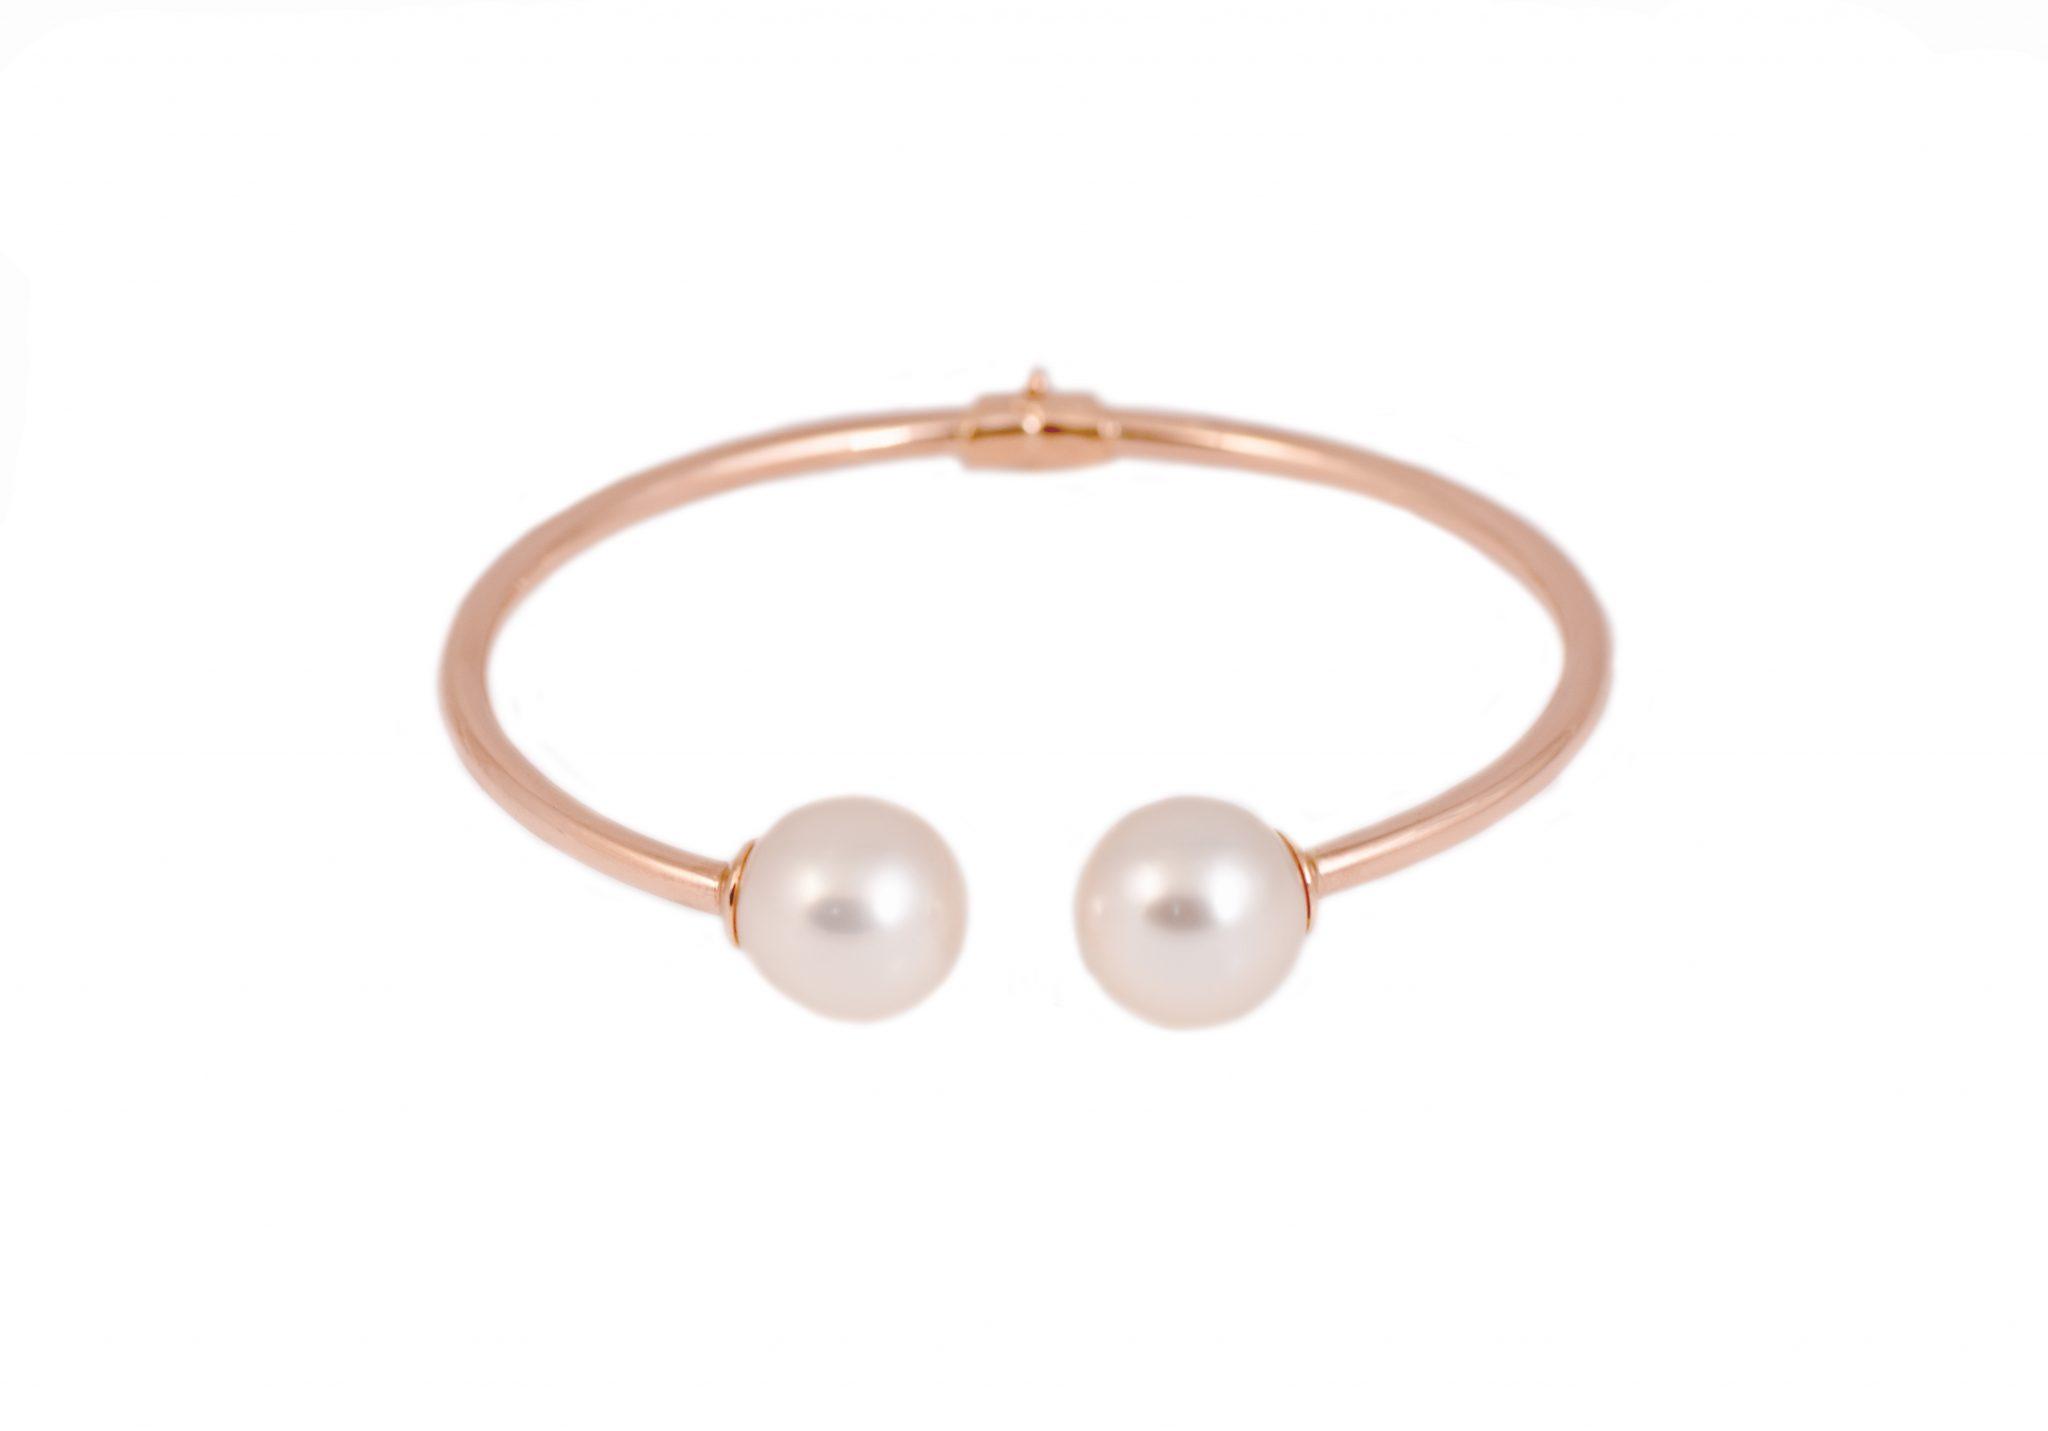 Rose Gold South Sea Pearl Bangle | B21330